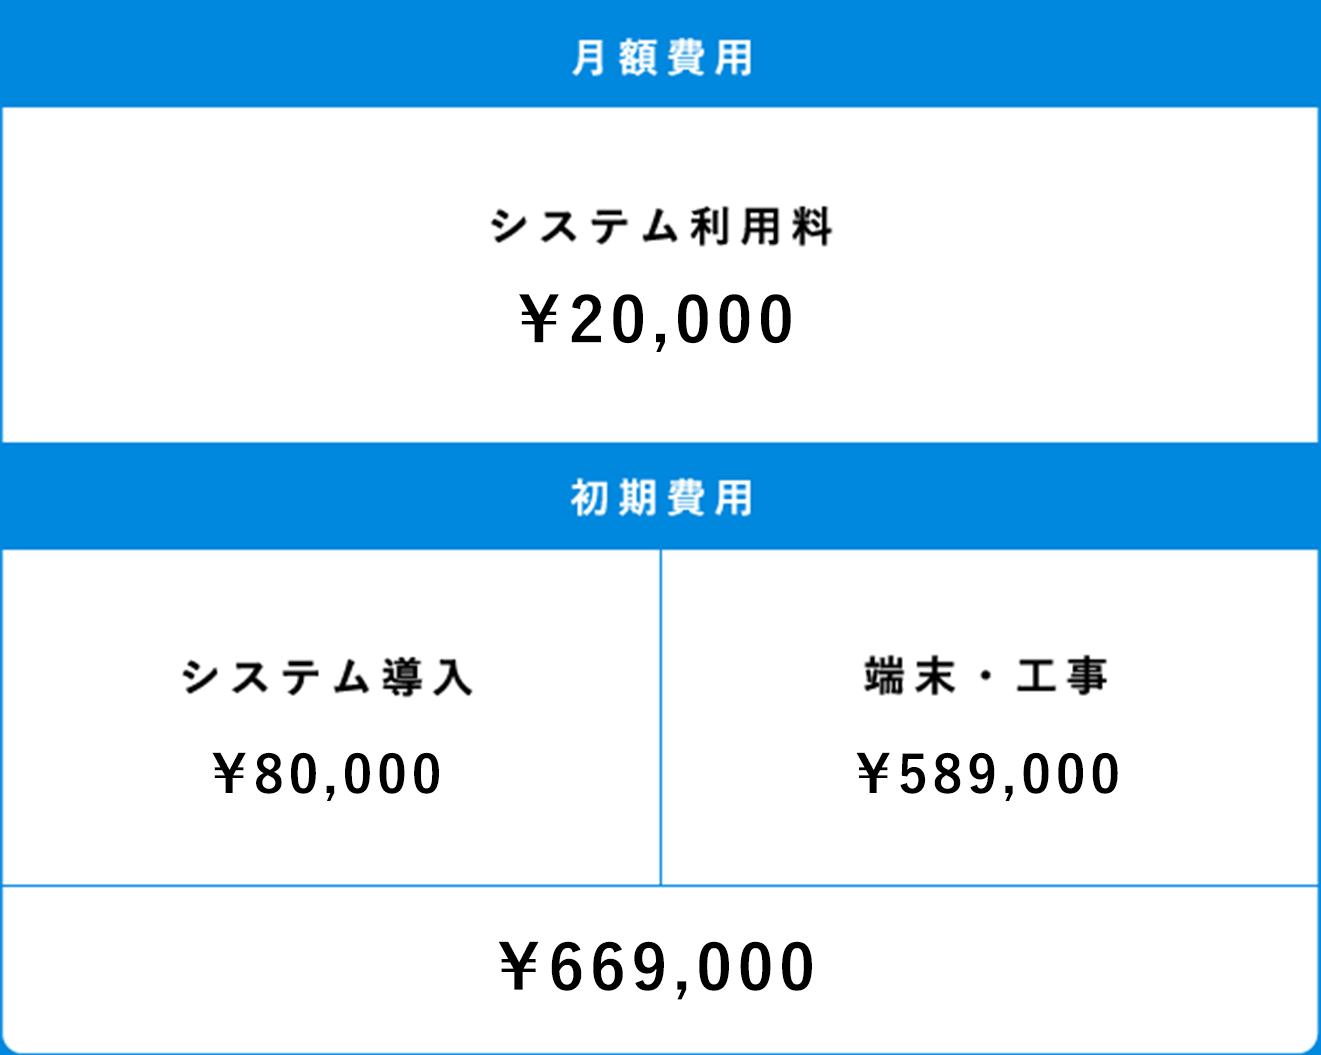 https://3daikan.com/assets/landing/board_price/TABLET.png